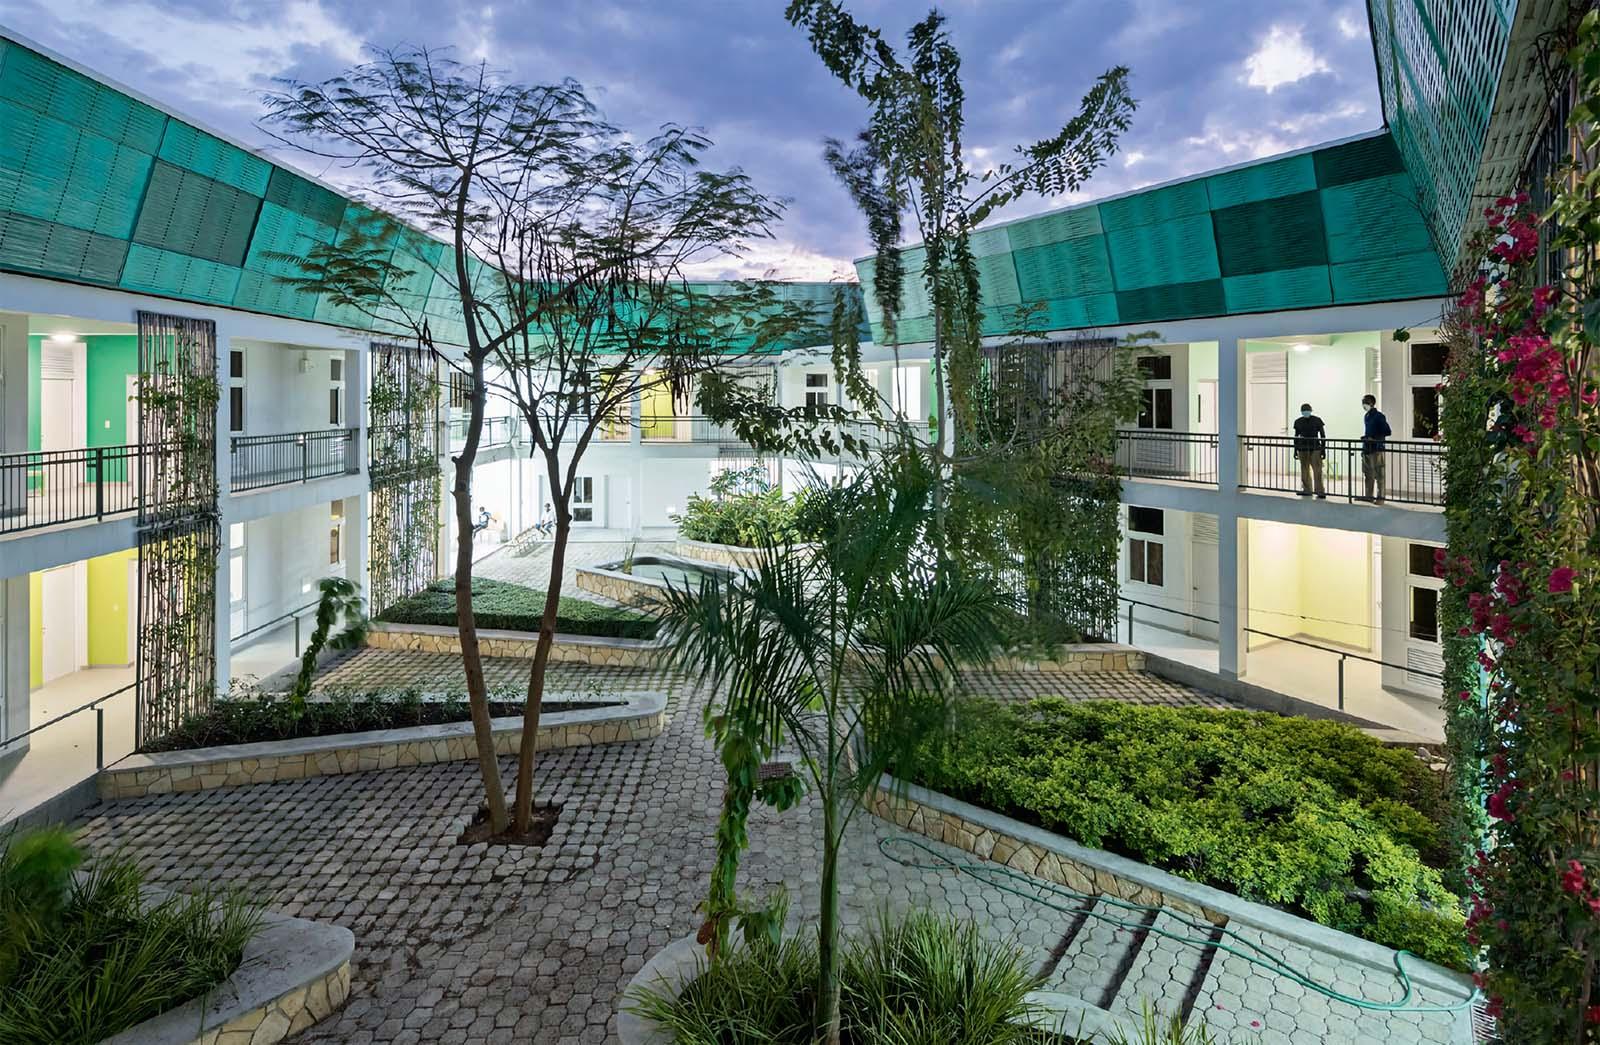 Architecture as good medicine